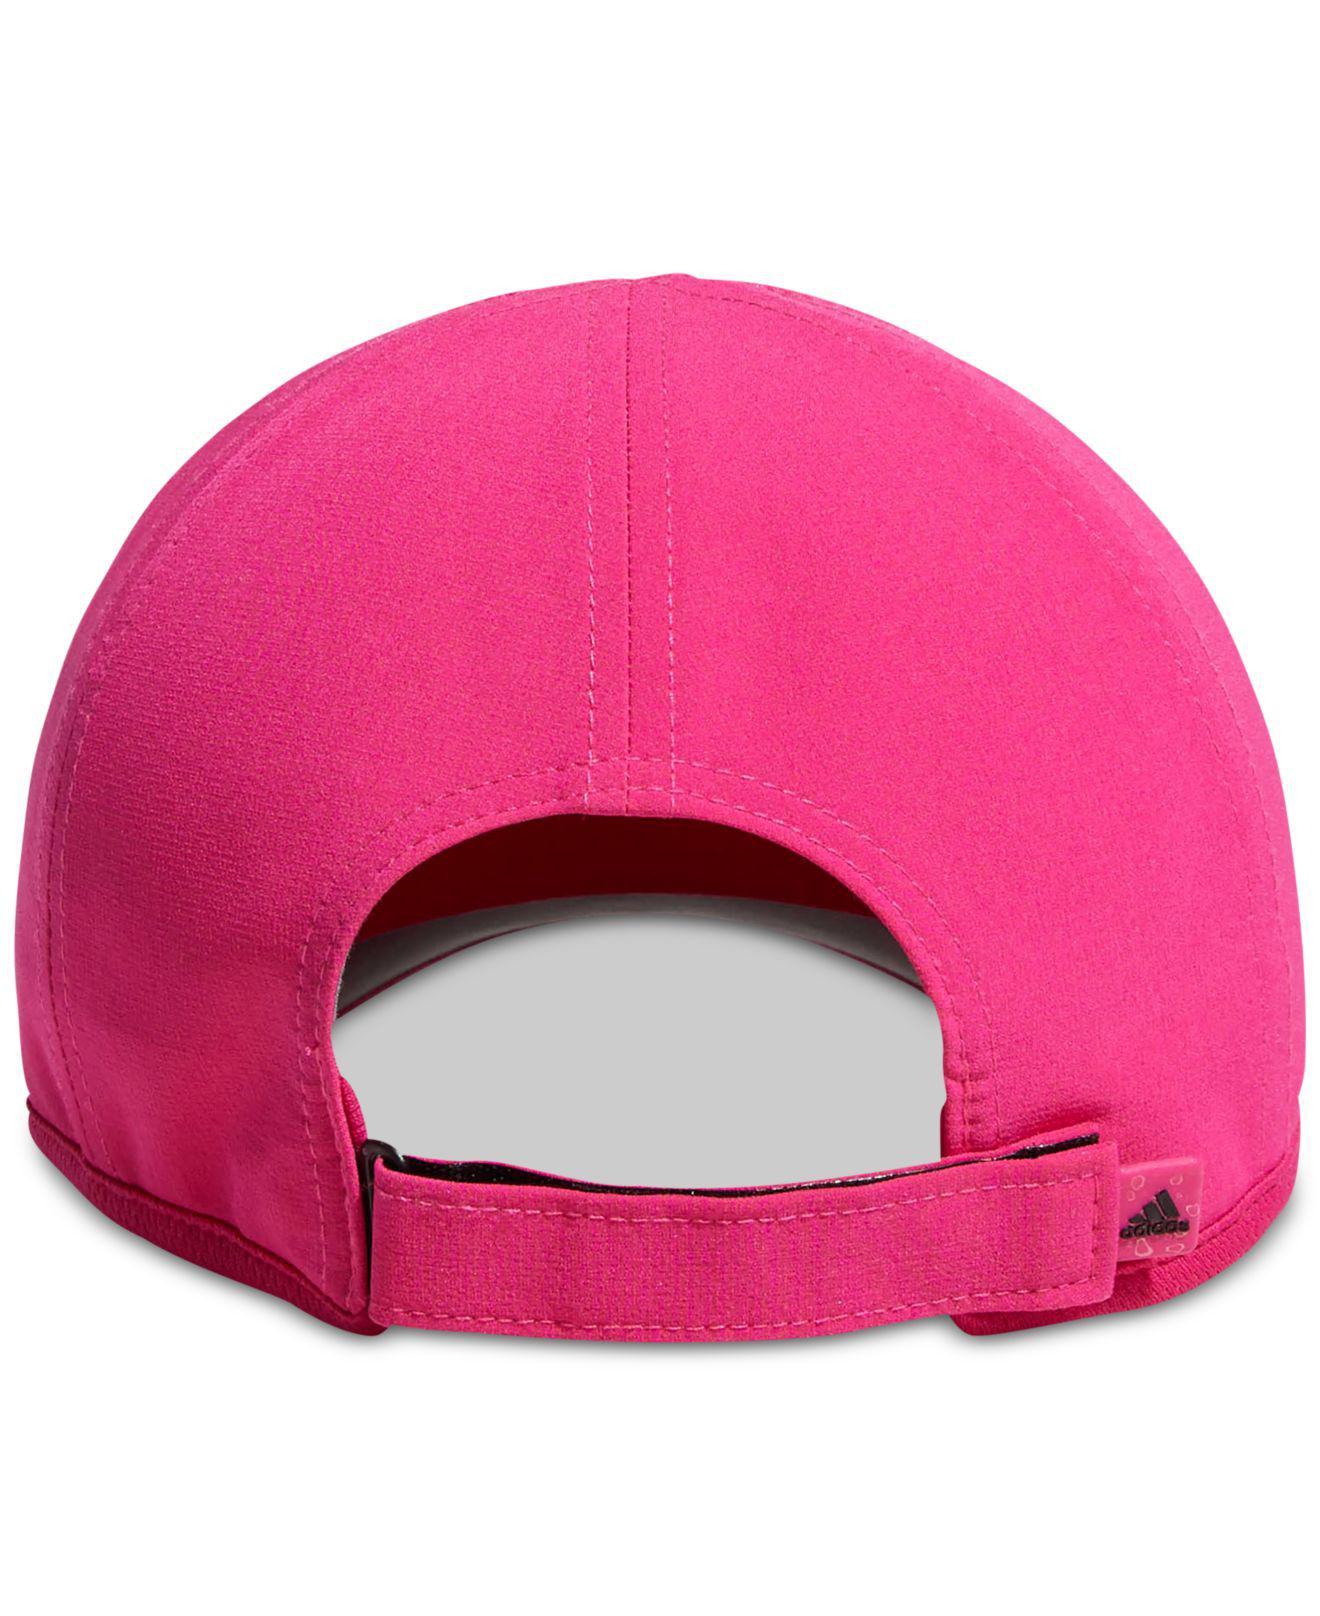 9b7861653b4 Adidas - Pink Superlite Cap - Lyst. View fullscreen